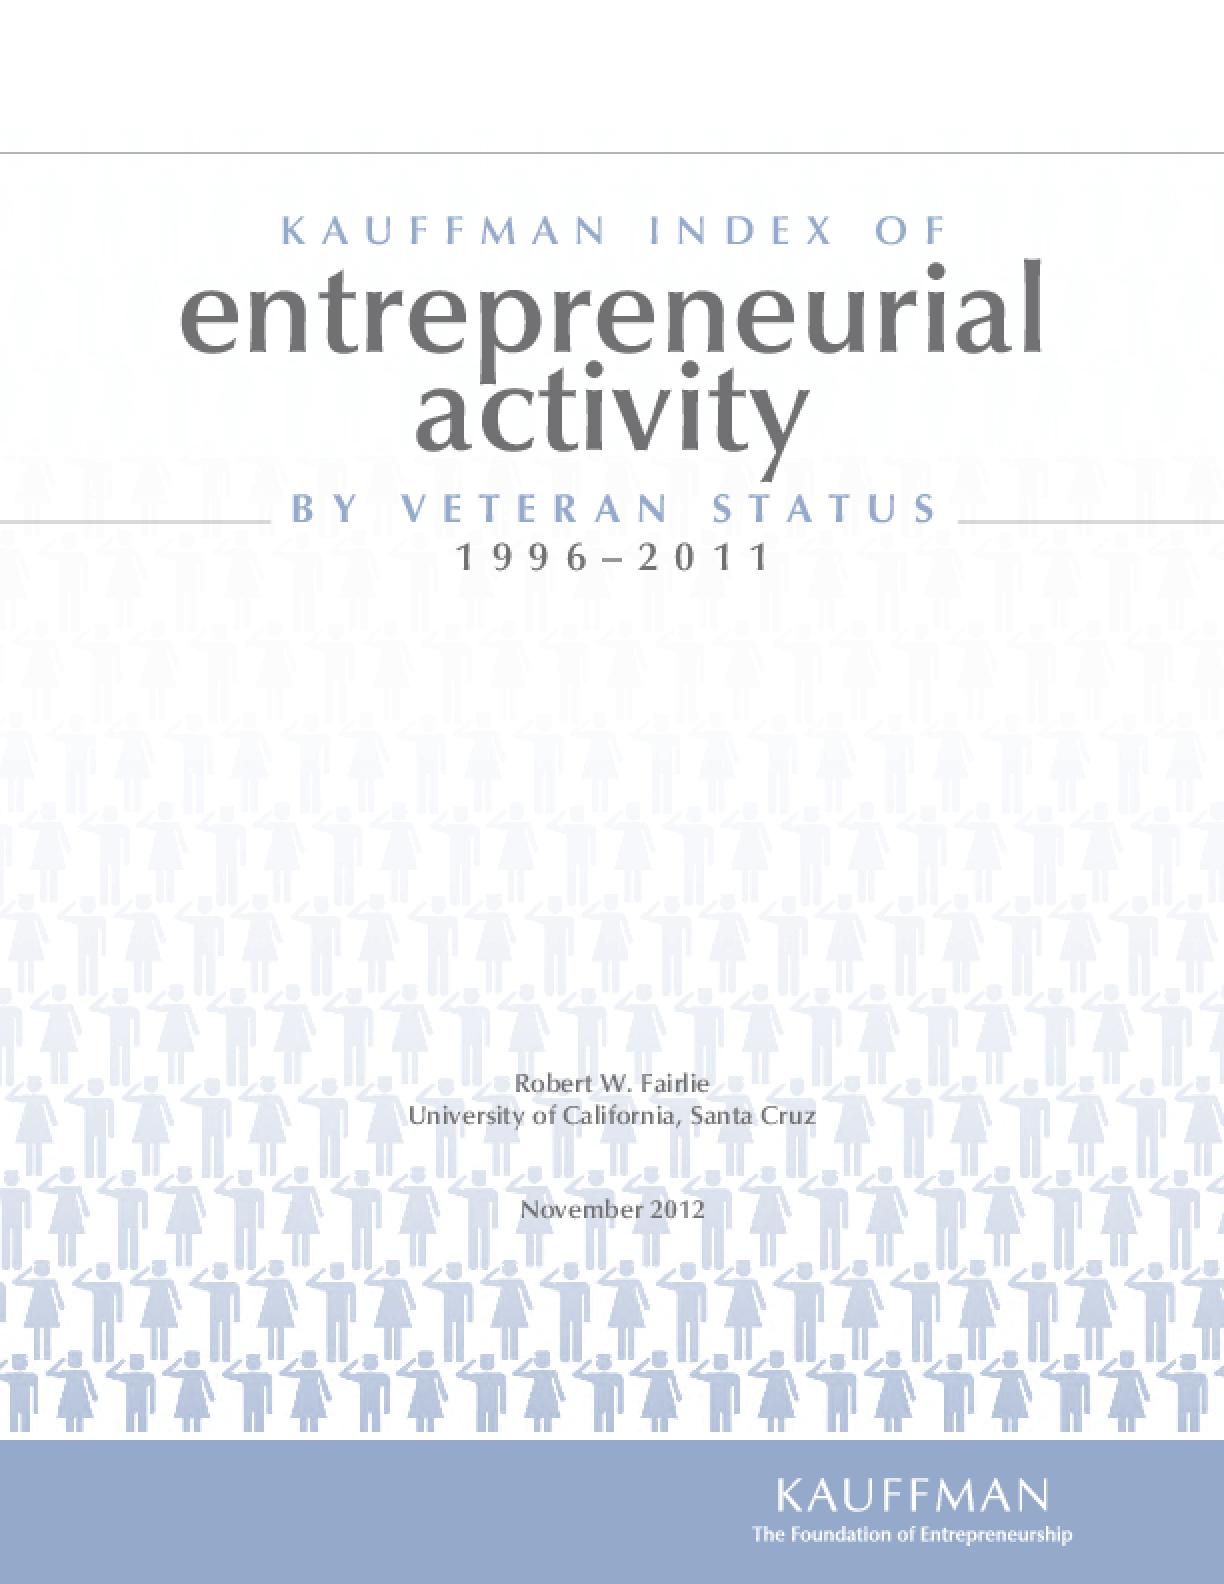 The Kauffman Index of Entrepreneurial Activity (KIEA) by Veteran Status: 1996-2011